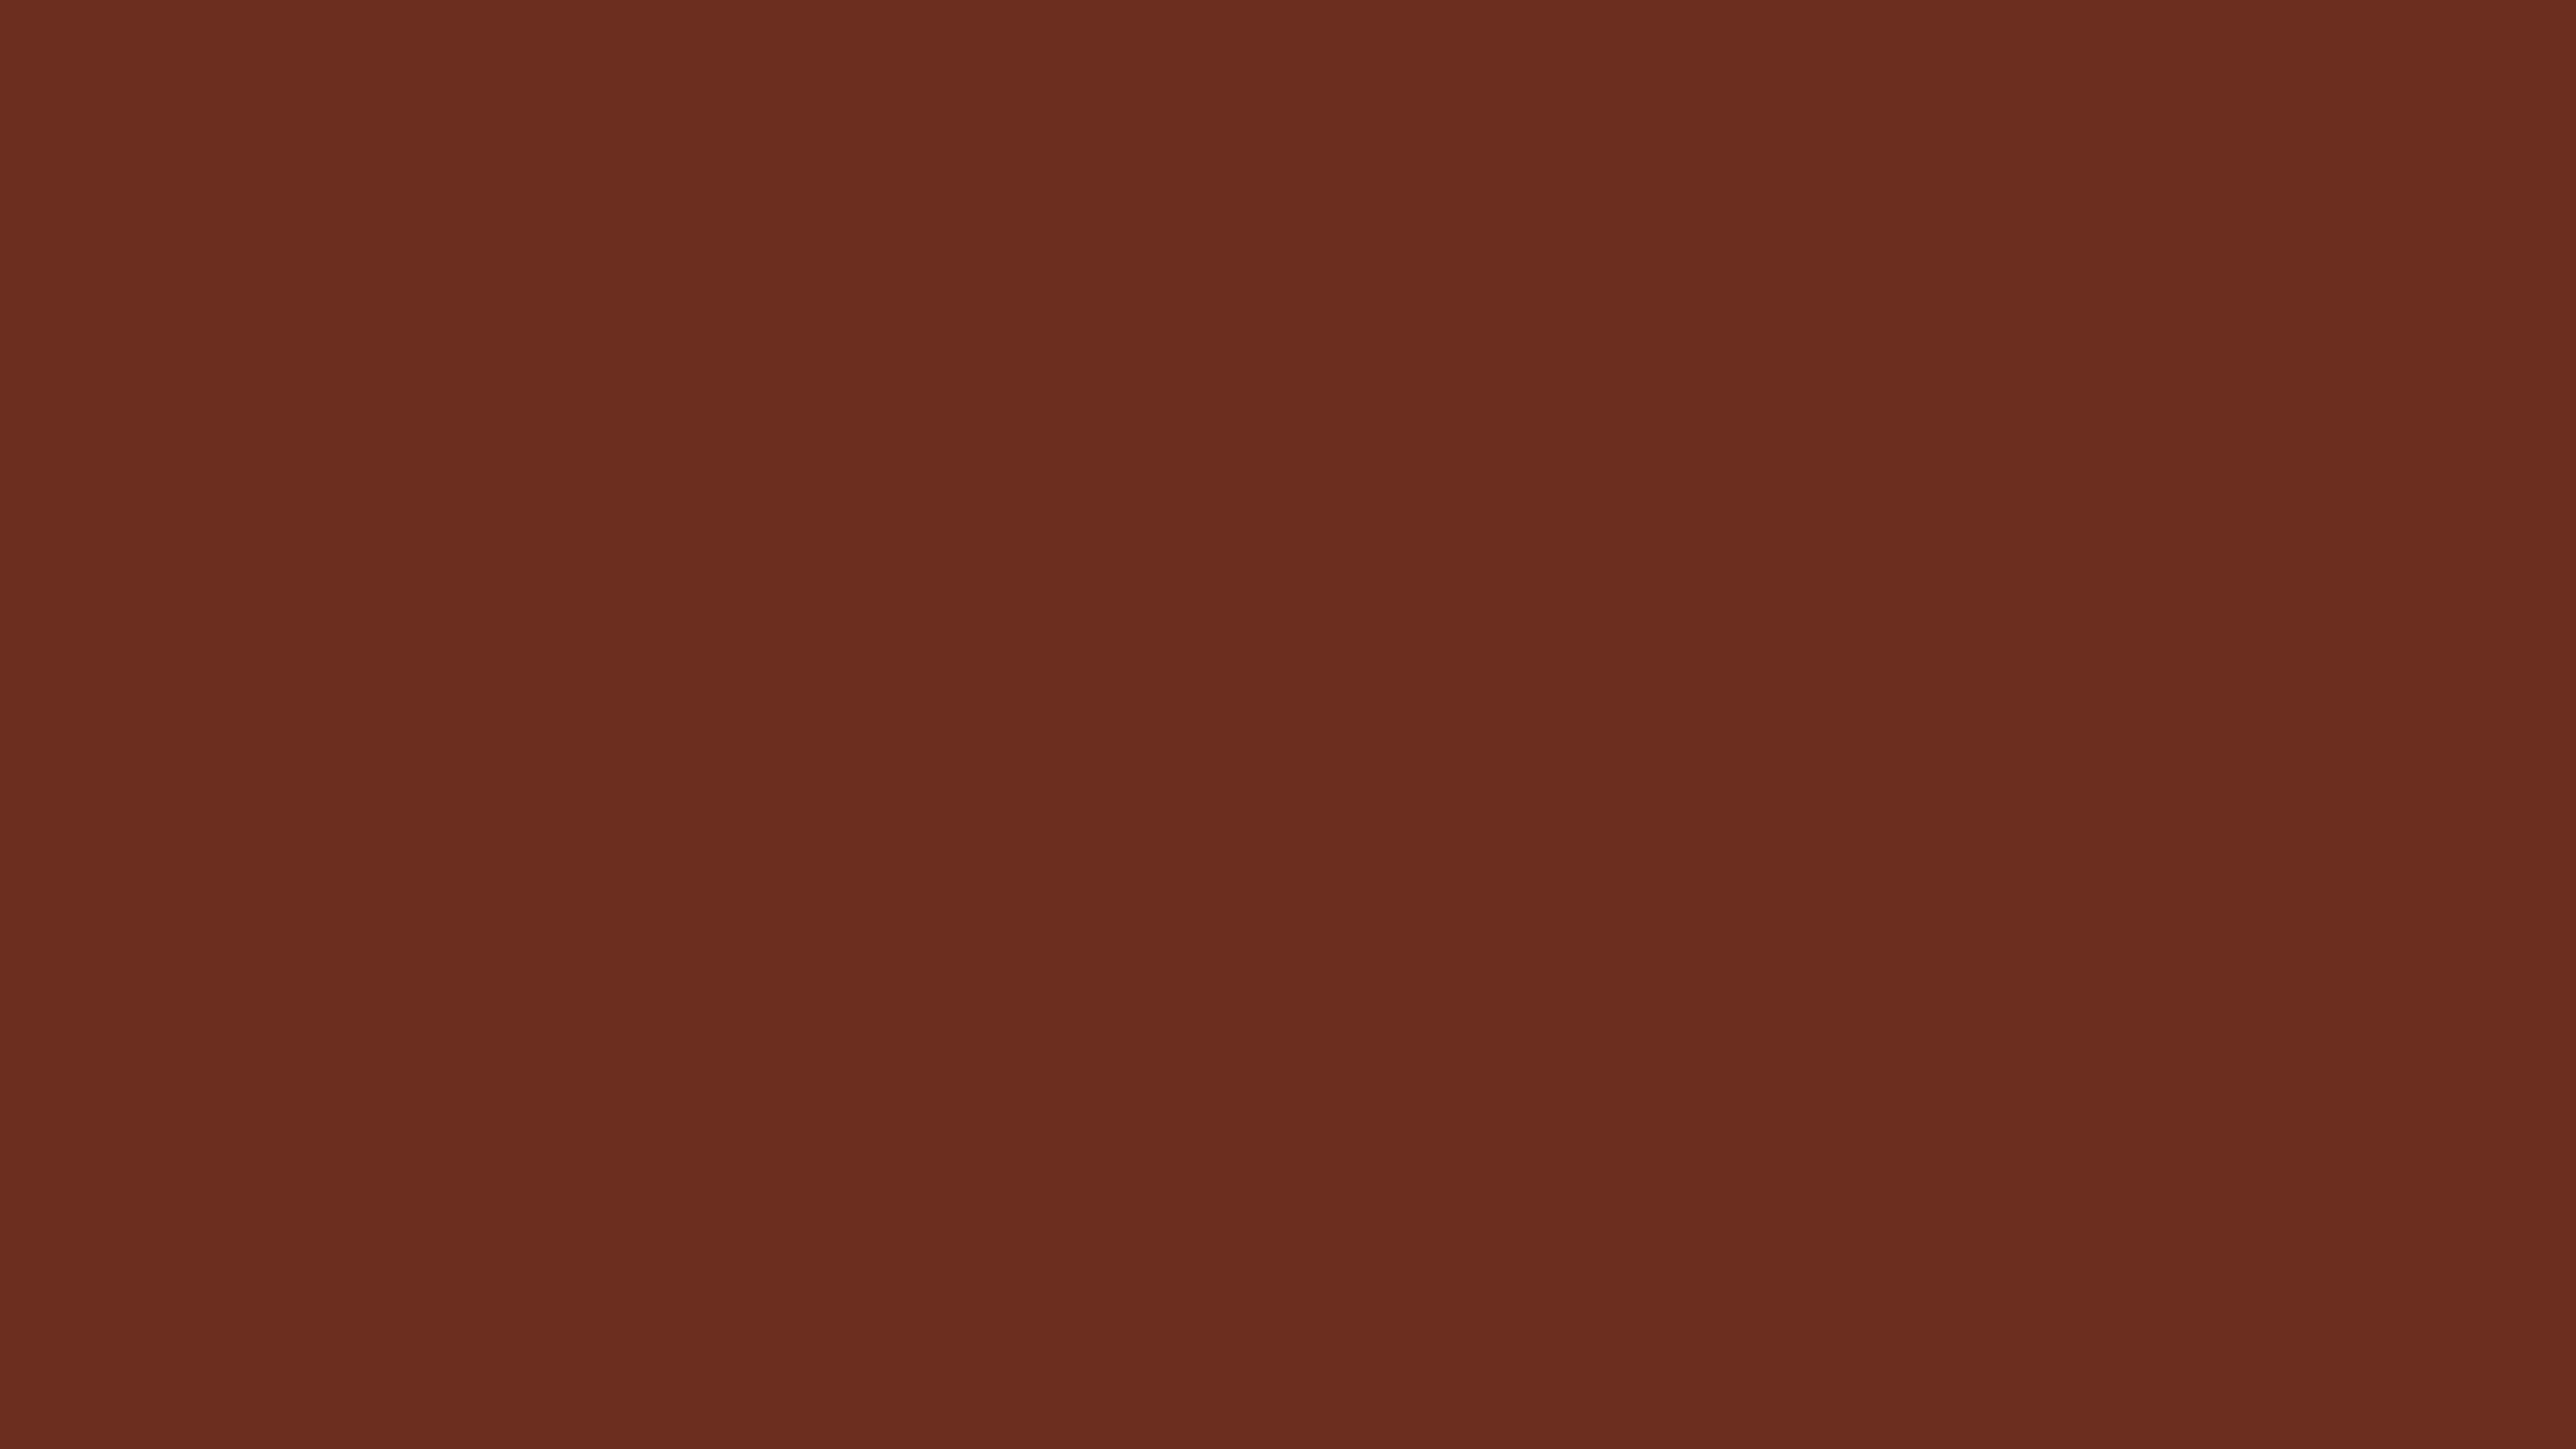 7680x4320 Liver Organ Solid Color Background